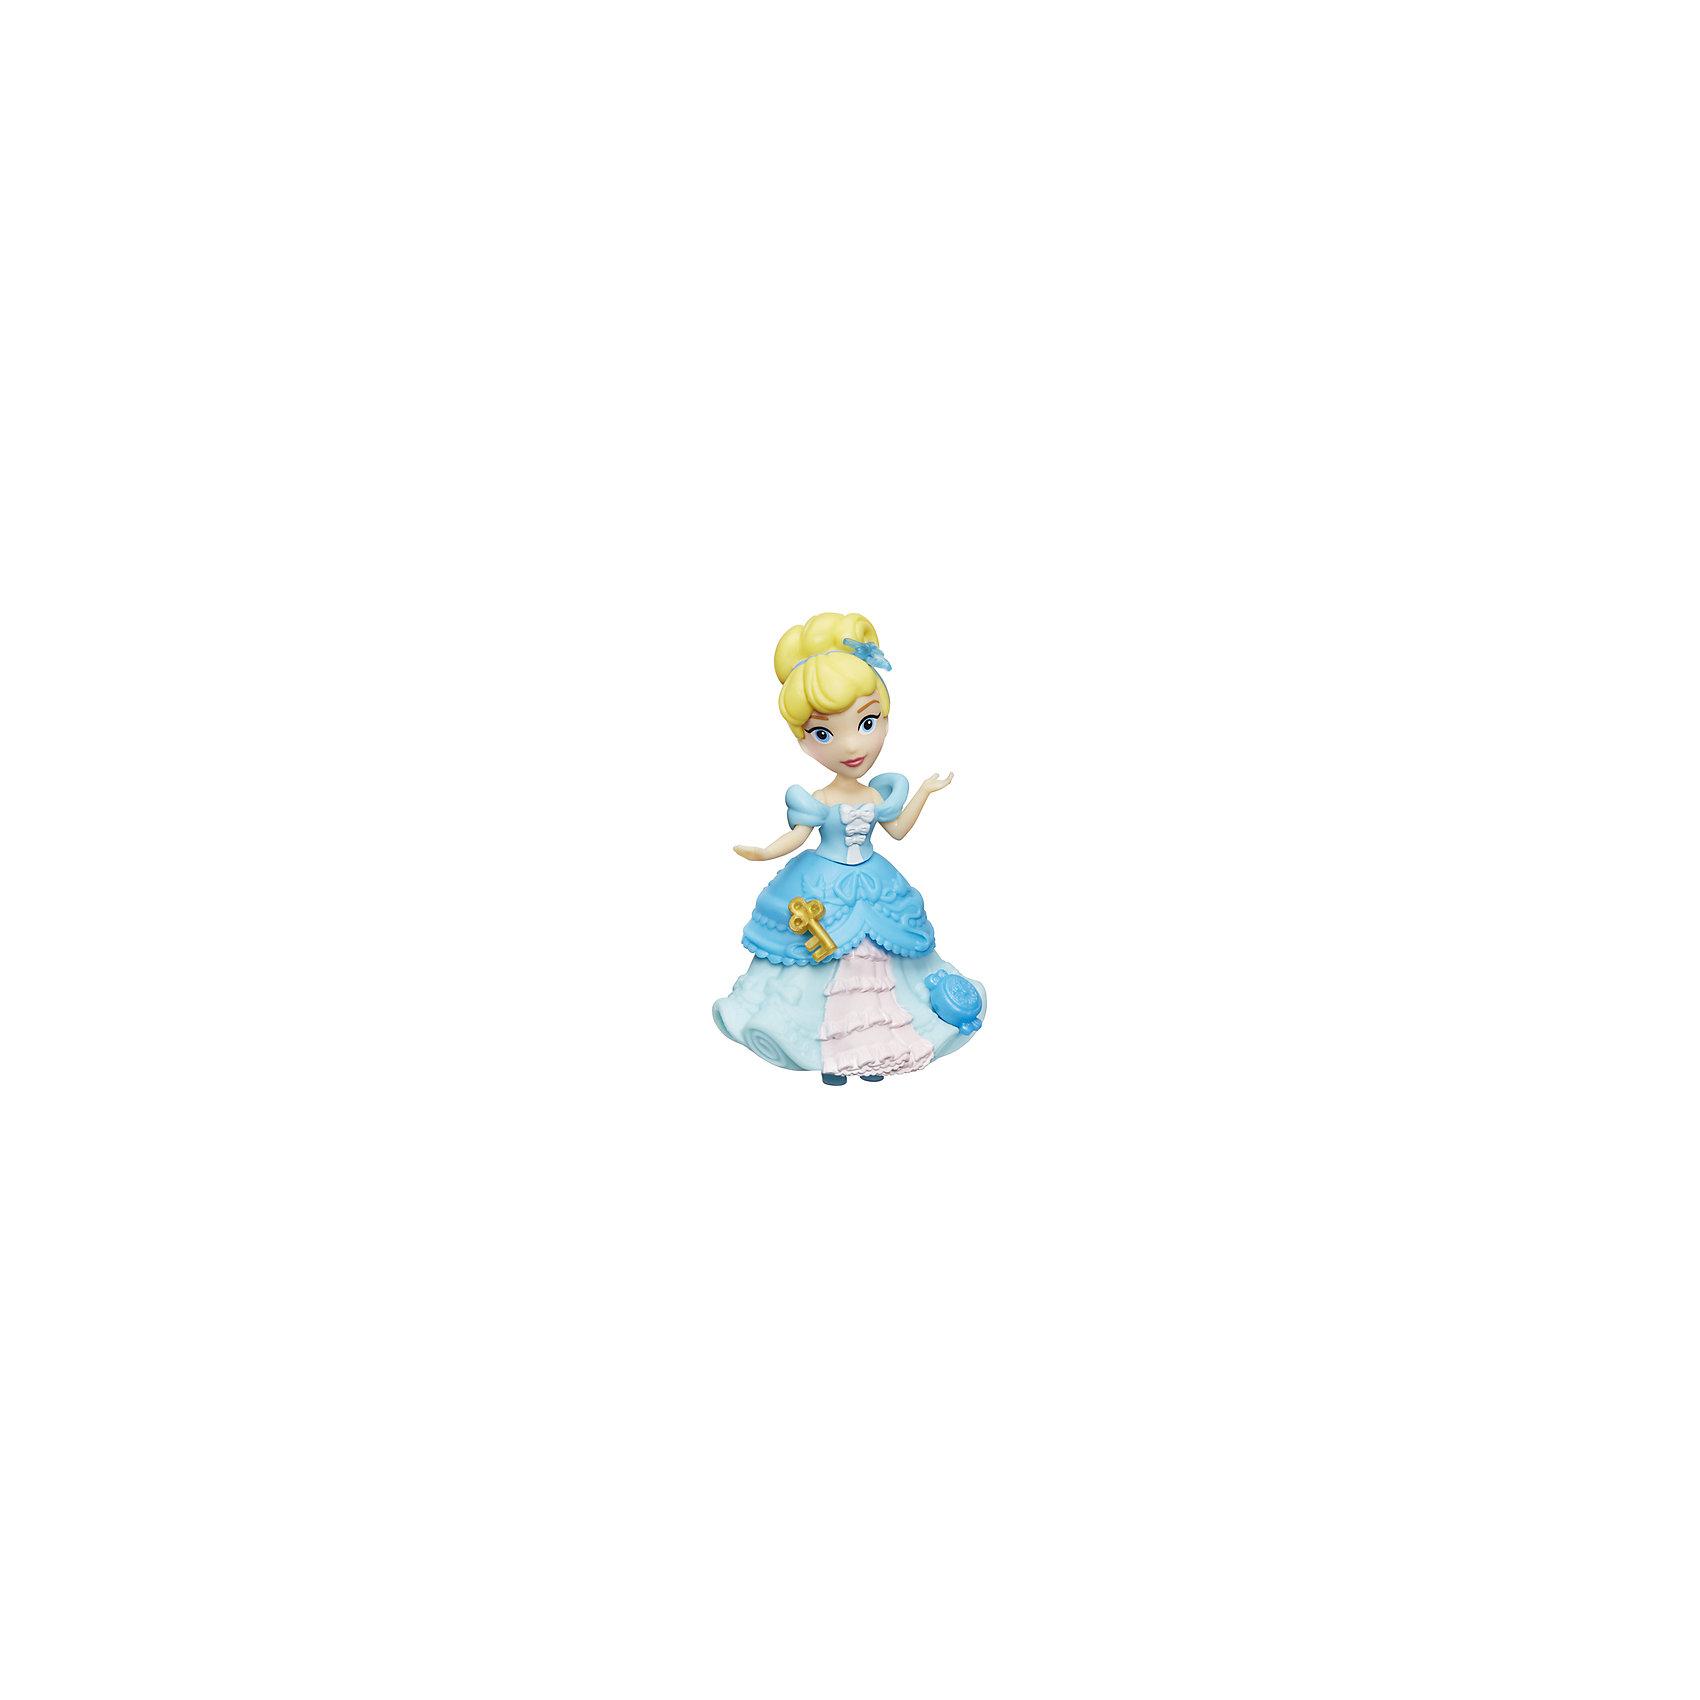 Мини-кукла Hasbro Disney Princess, ЗолушкаМини-куклы<br><br><br>Ширина мм: 176<br>Глубина мм: 152<br>Высота мм: 63<br>Вес г: 100<br>Возраст от месяцев: 48<br>Возраст до месяцев: 96<br>Пол: Женский<br>Возраст: Детский<br>SKU: 7120187